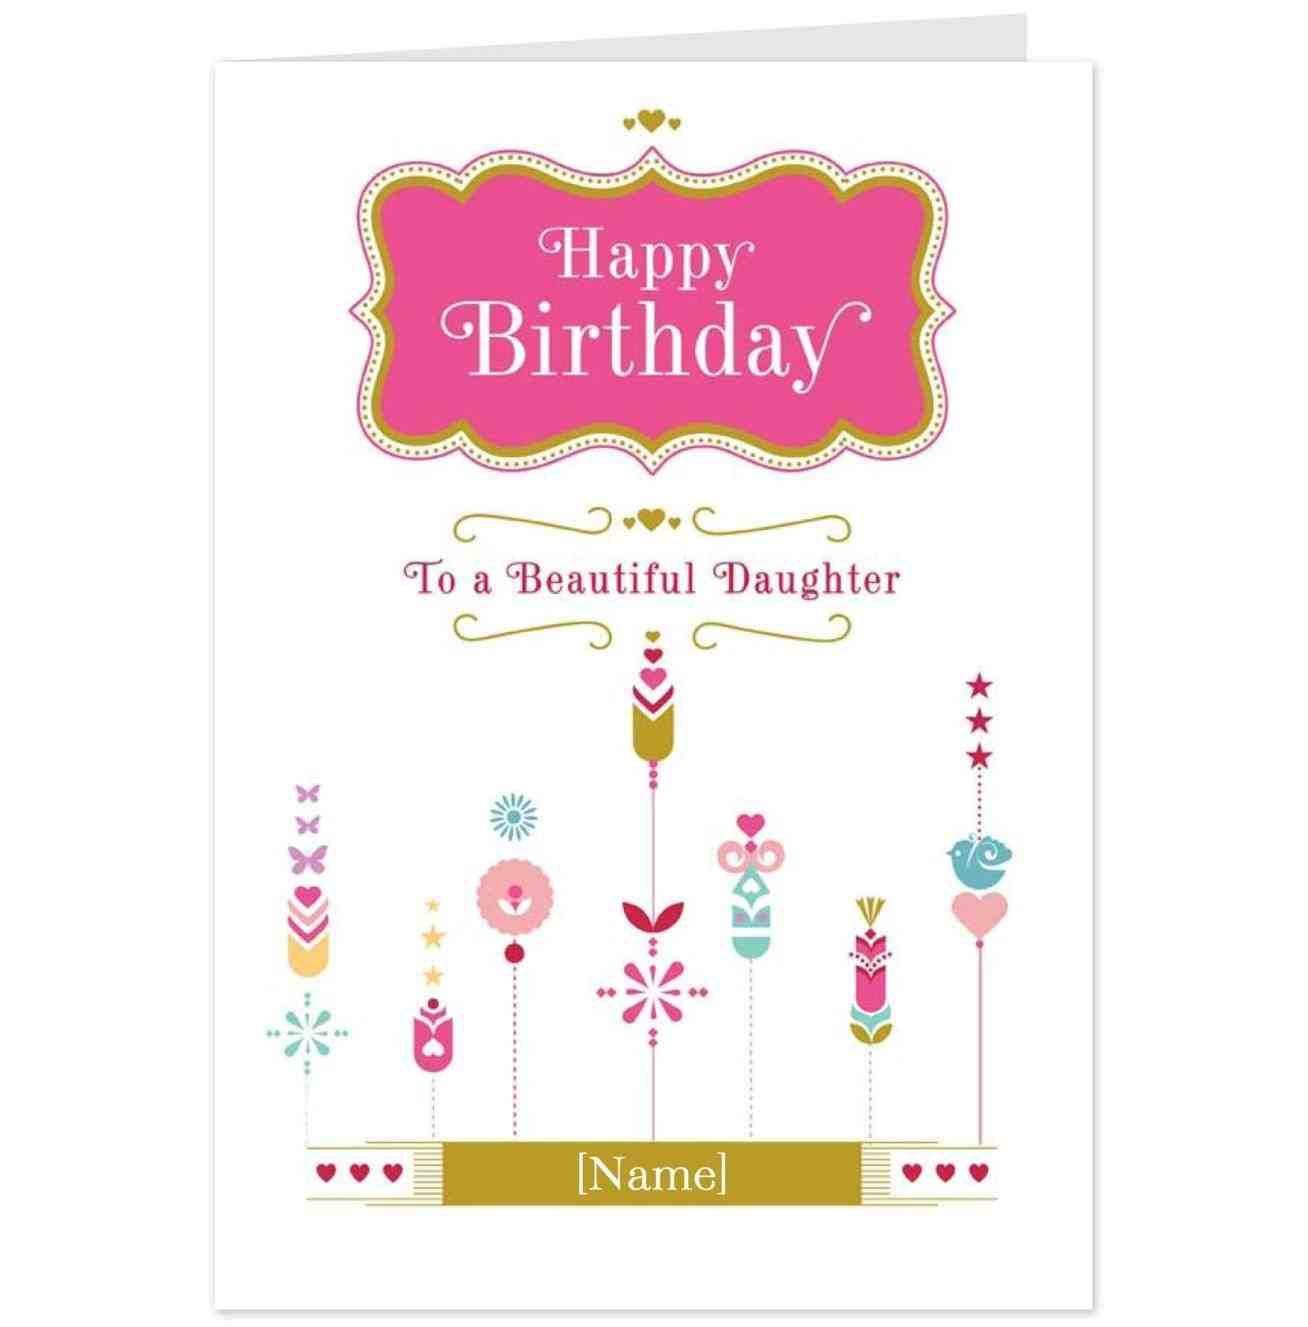 free ecard birthday cards hallmark (With images)  Electronic birthday cards, Birthday card with